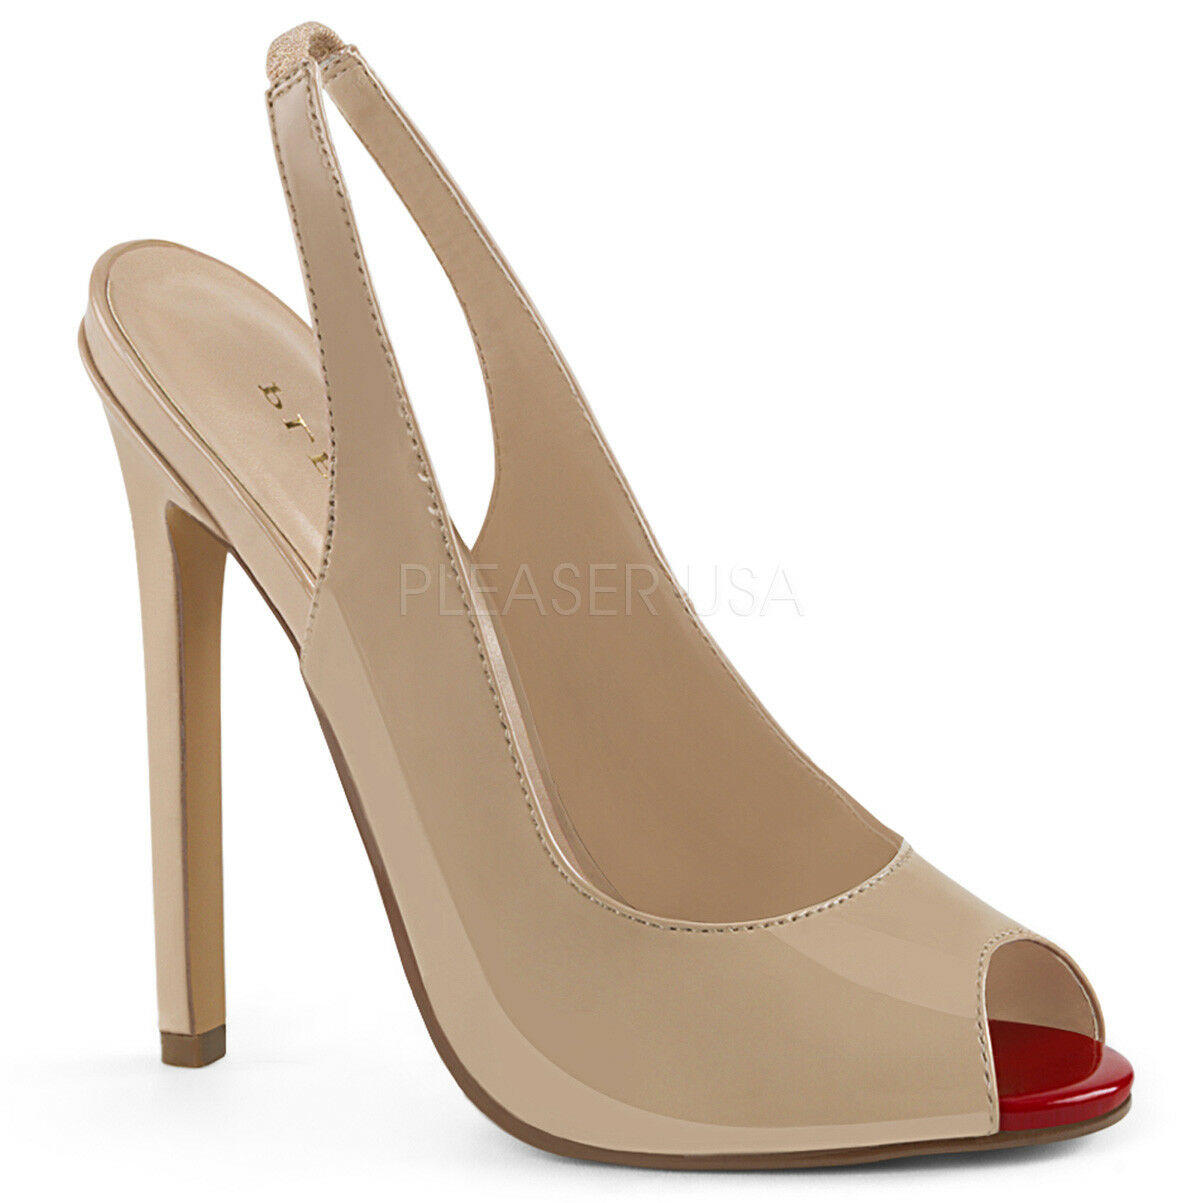 Pleaser Peeptoe SEXY20.3cm 12.7cm Stiletto Blockabsatz Peeptoe Pleaser Riemen Sandalen Schuhe 3 085b9e